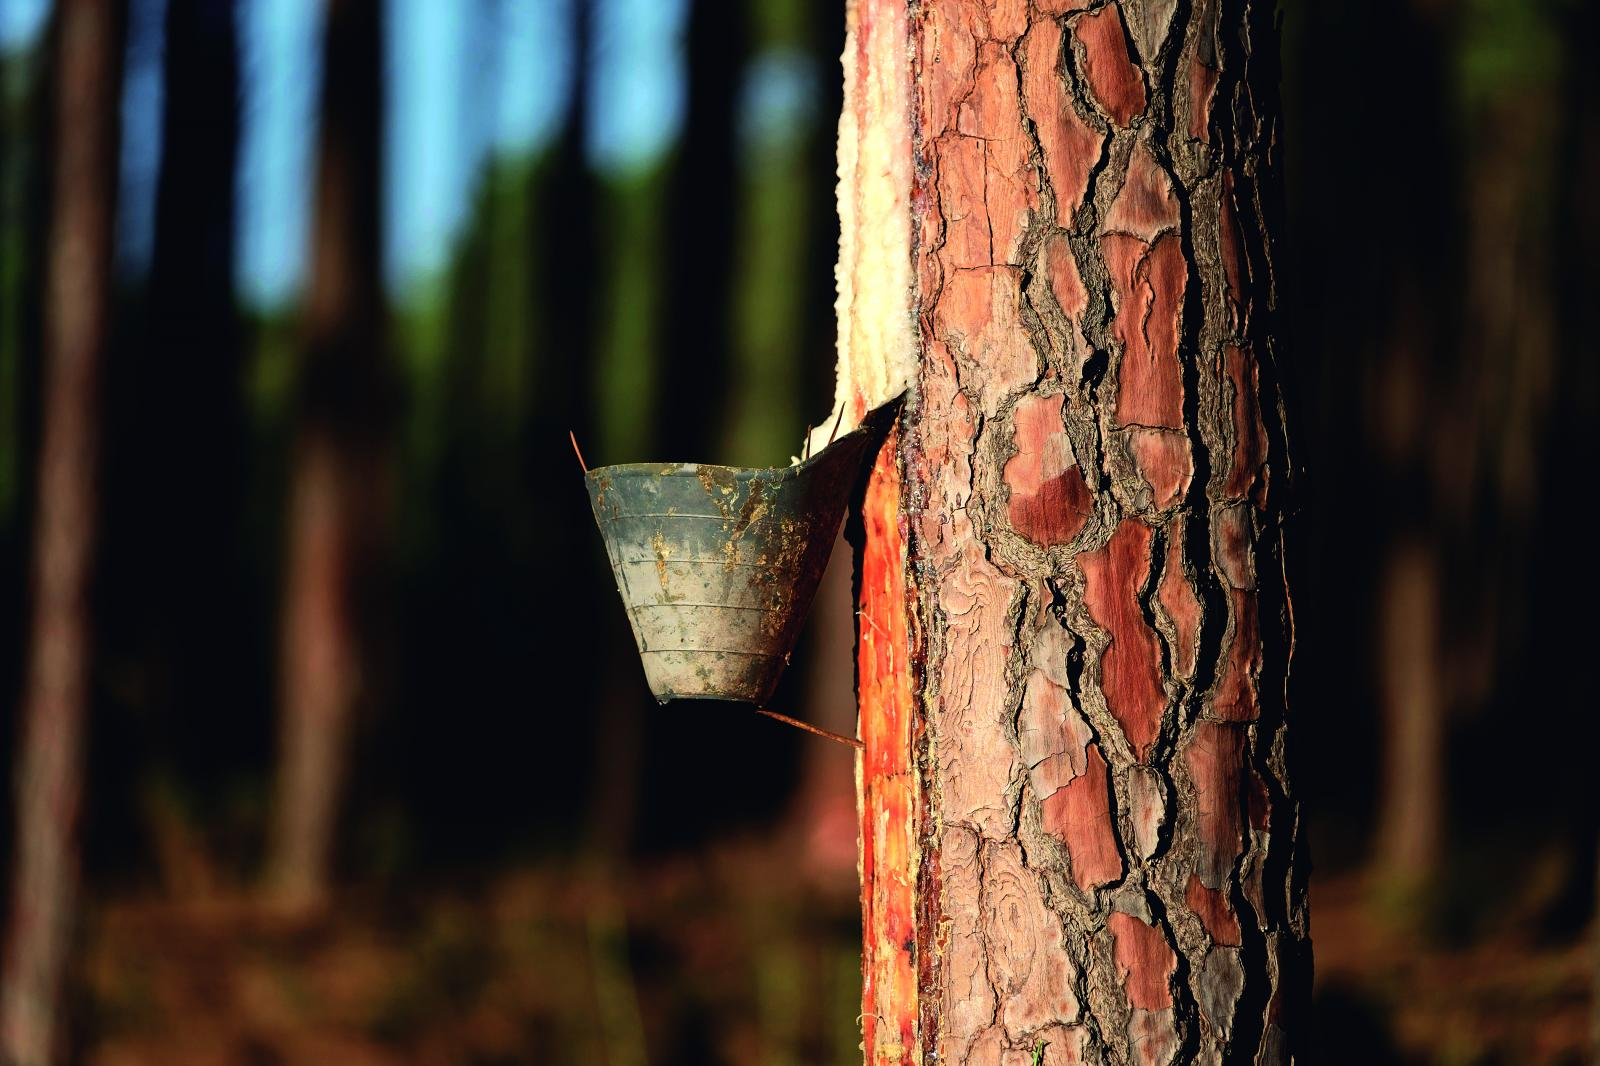 1.000 toneladas de Resina Natural del Pinus Pinaster Soriano en 2018